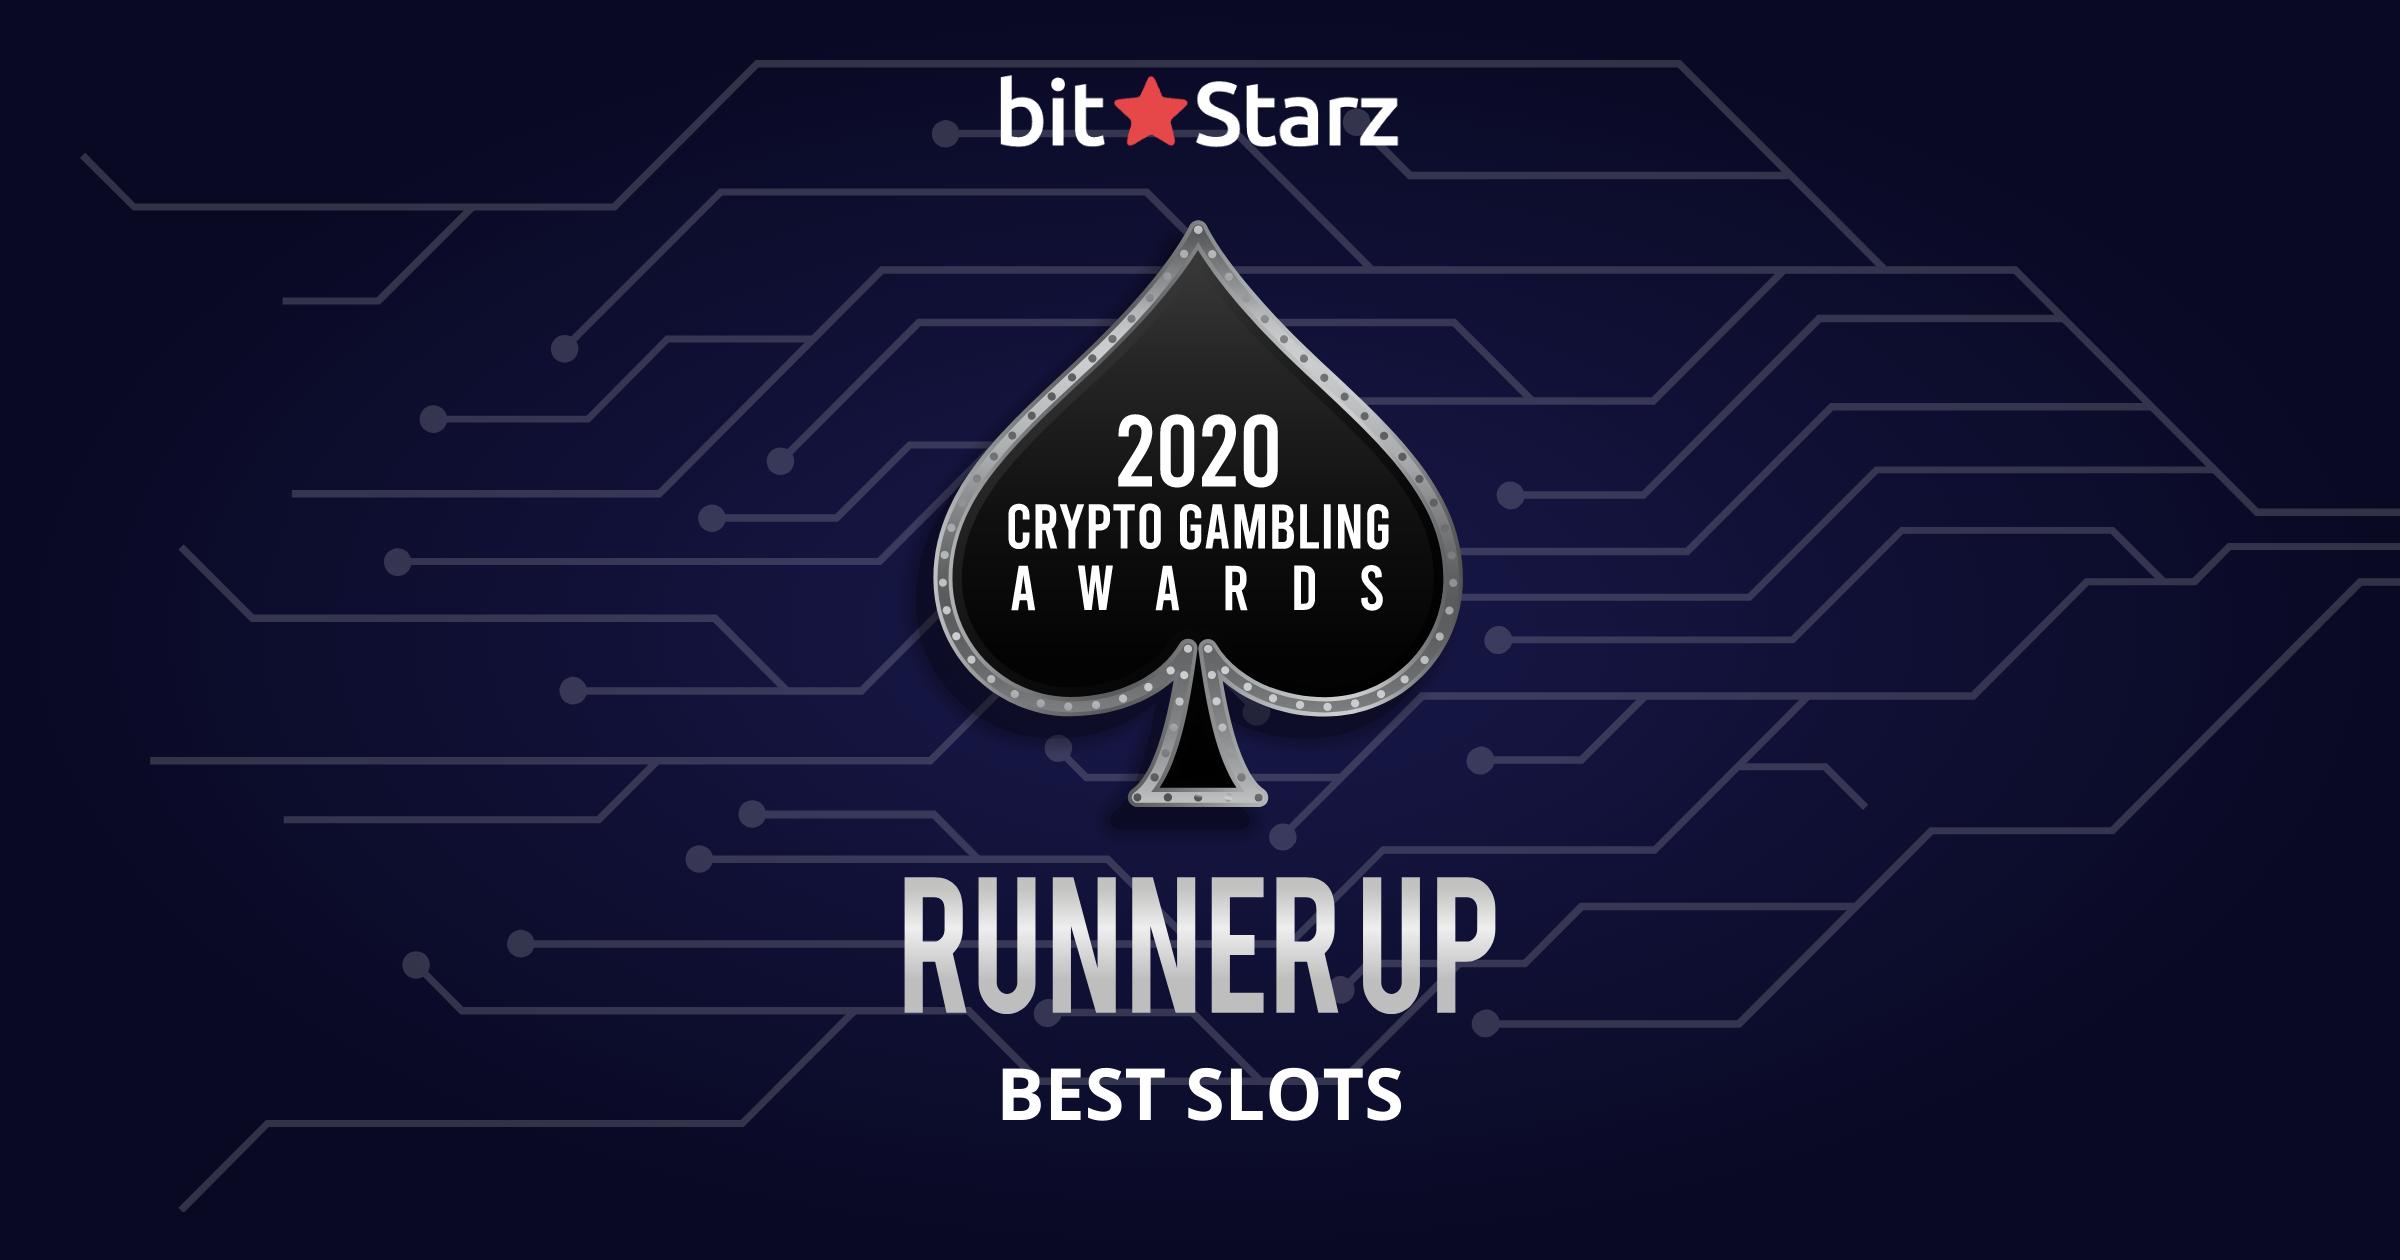 Crypto Gambling Awards won by BitStarz